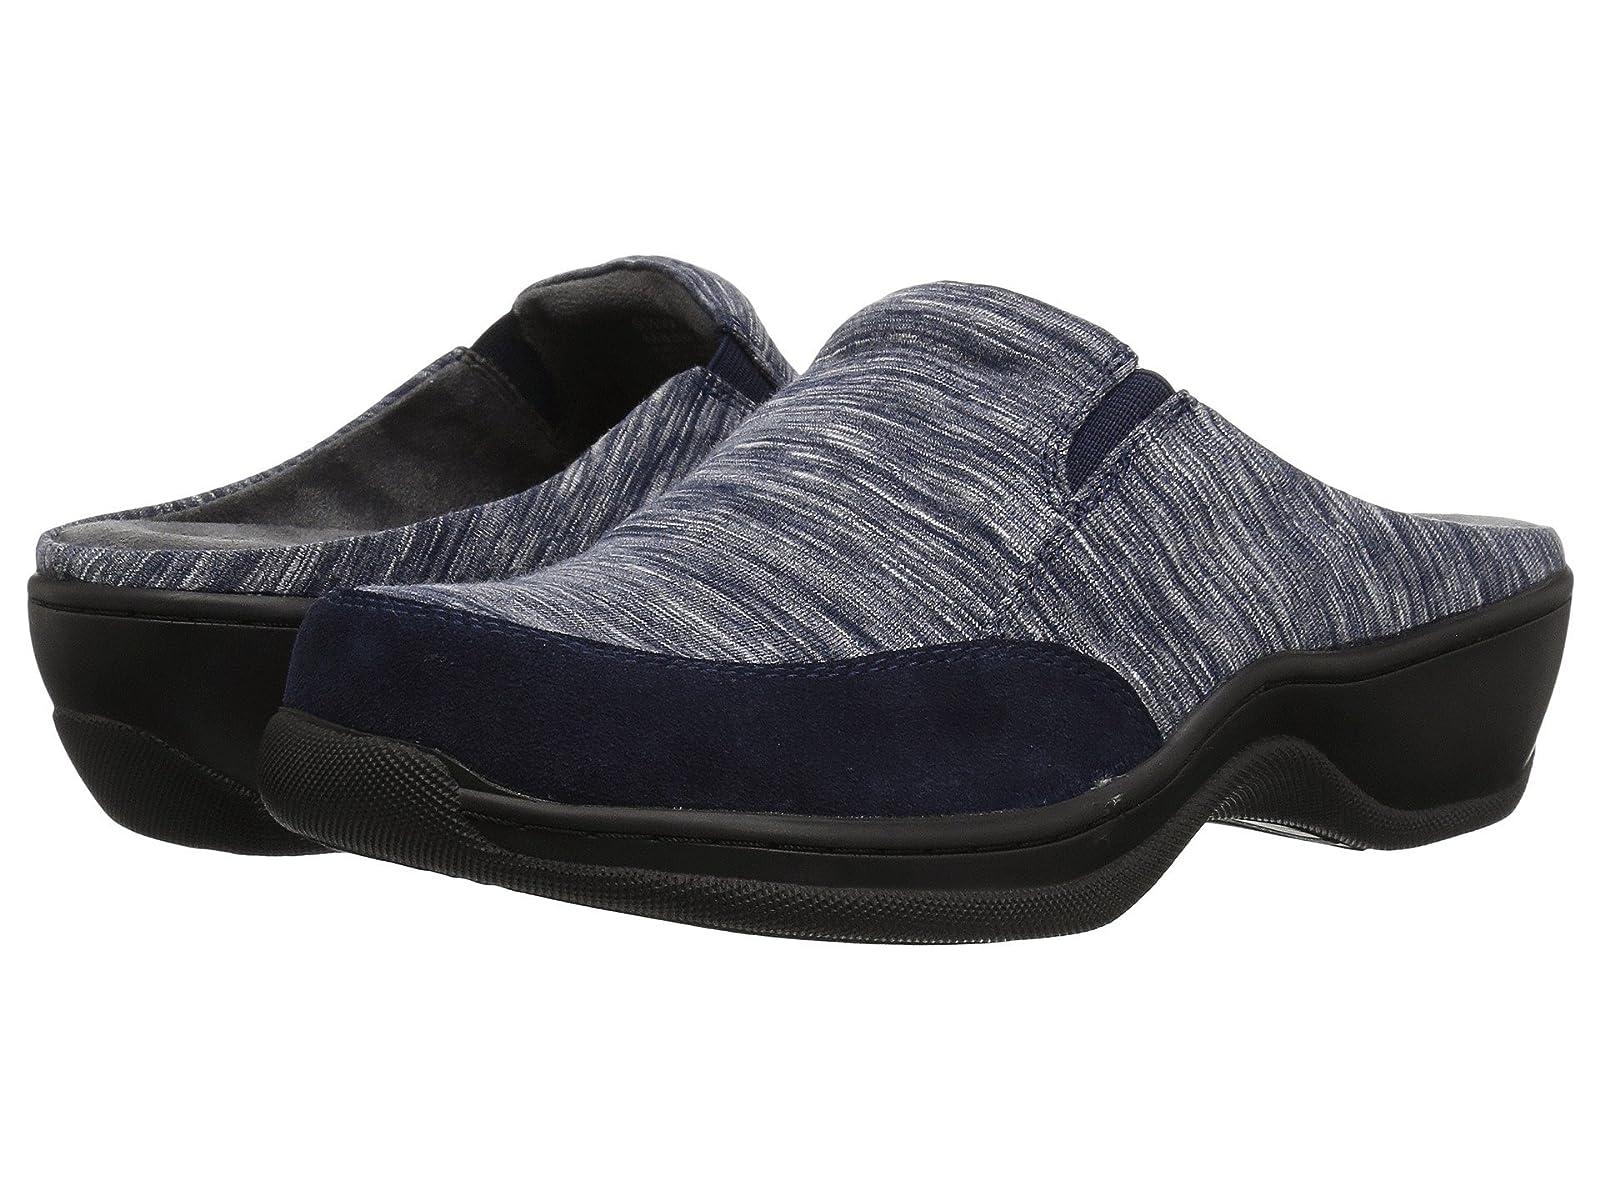 SoftWalk AlconAtmospheric grades have affordable shoes